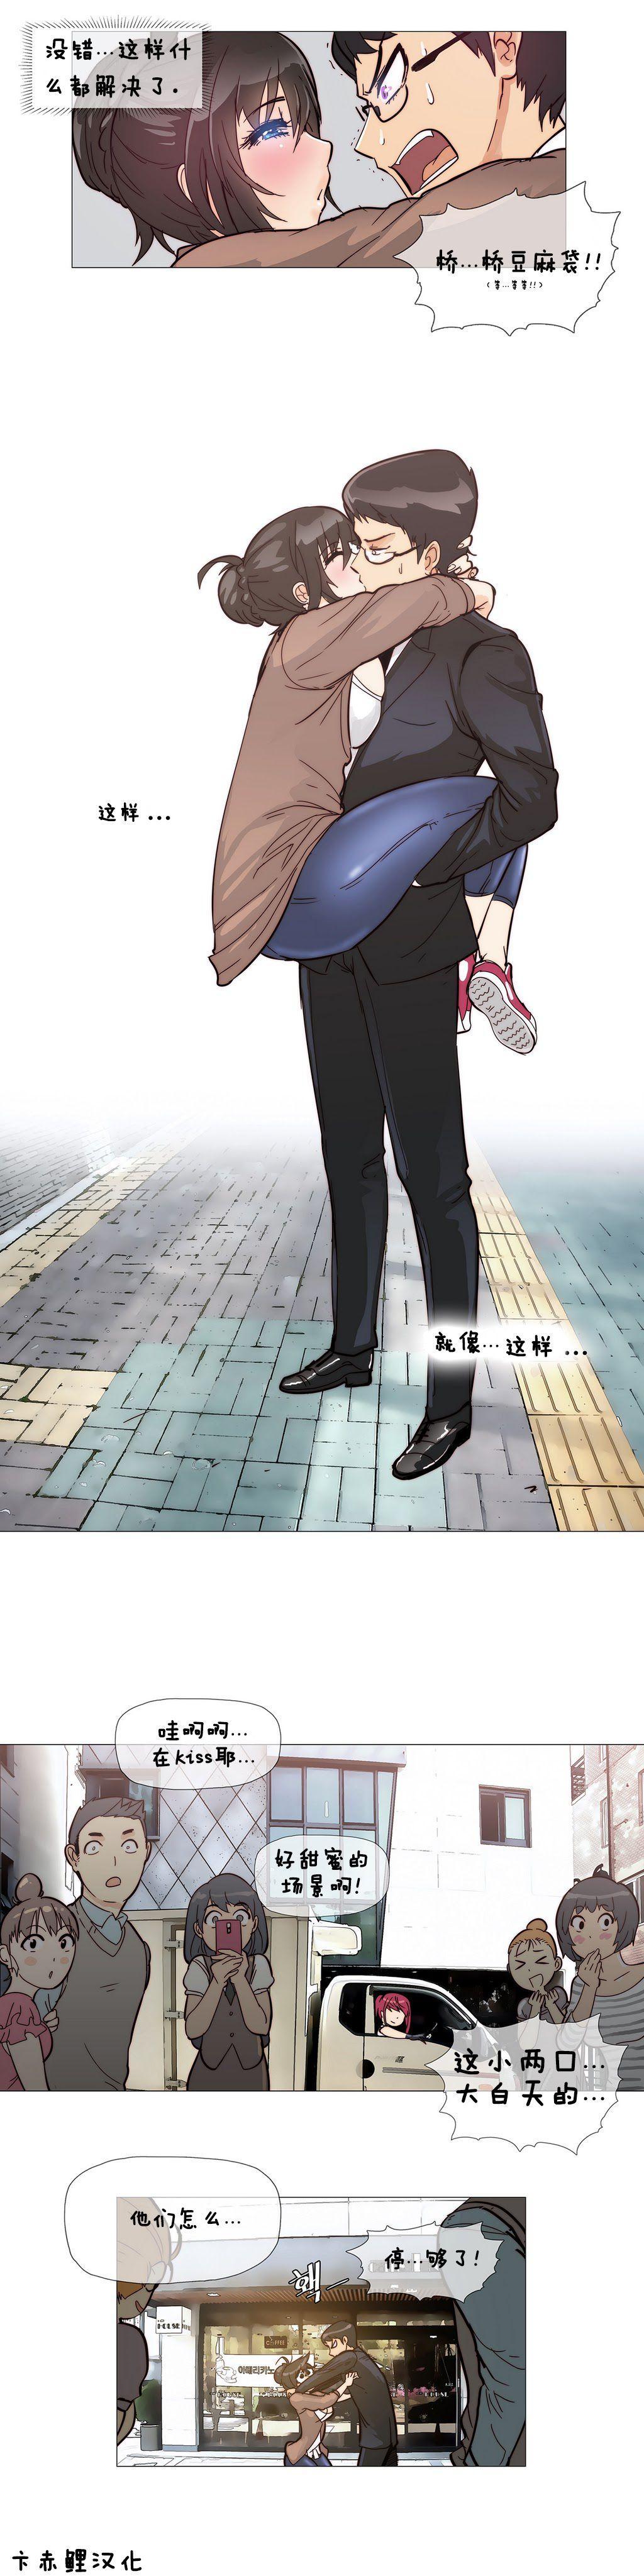 HouseHold Affairs 【卞赤鲤个人汉化】1~33话(持续更新中) 89